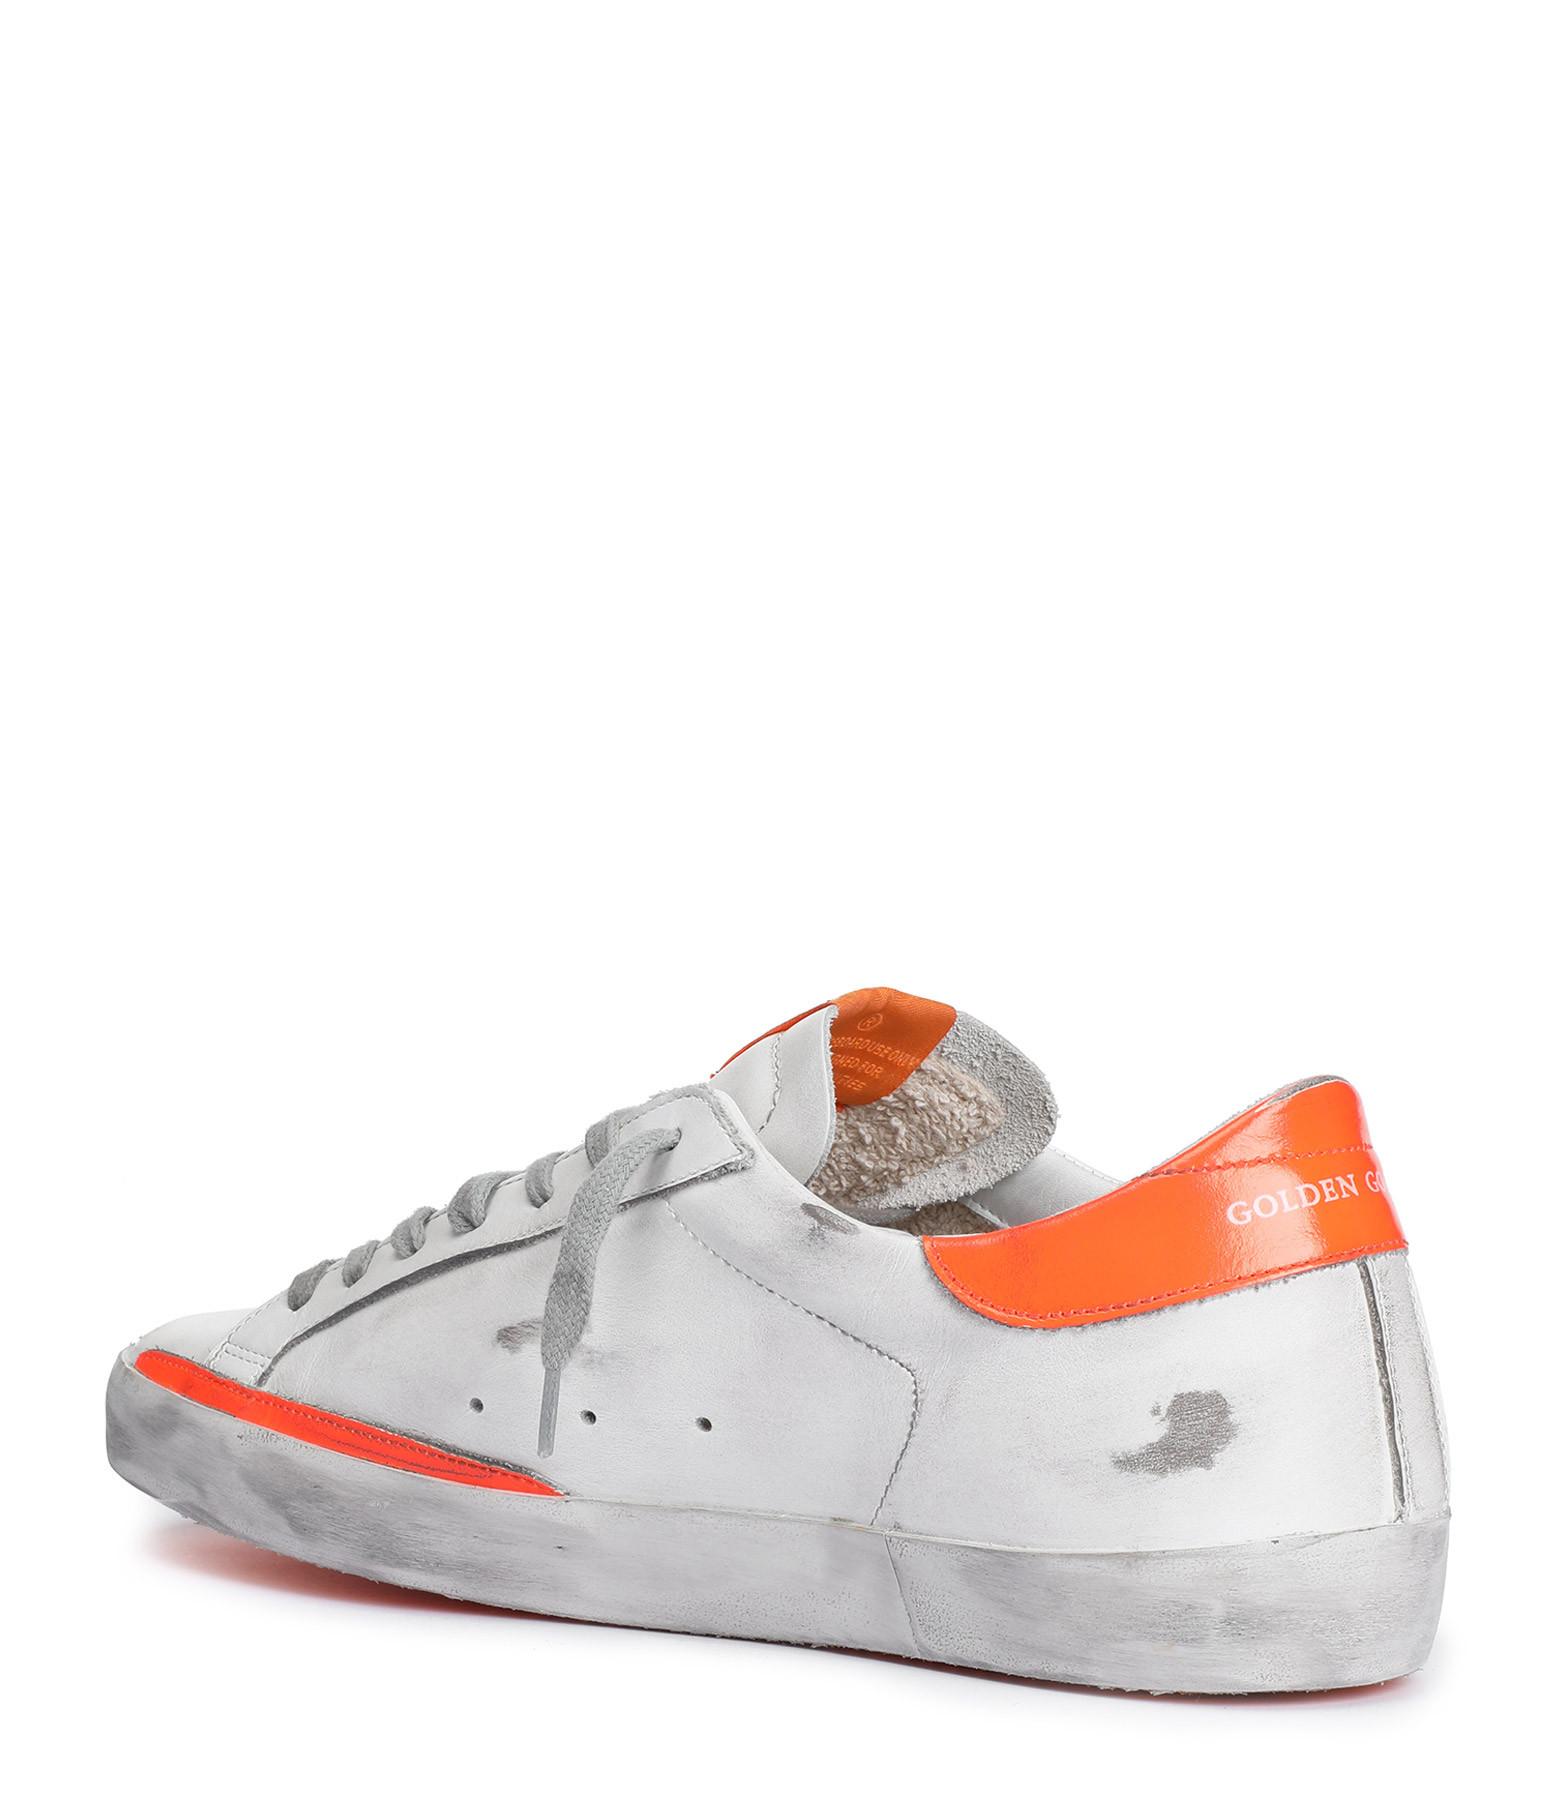 GOLDEN GOOSE - Baskets Homme Superstar Cuir Blanc Orange